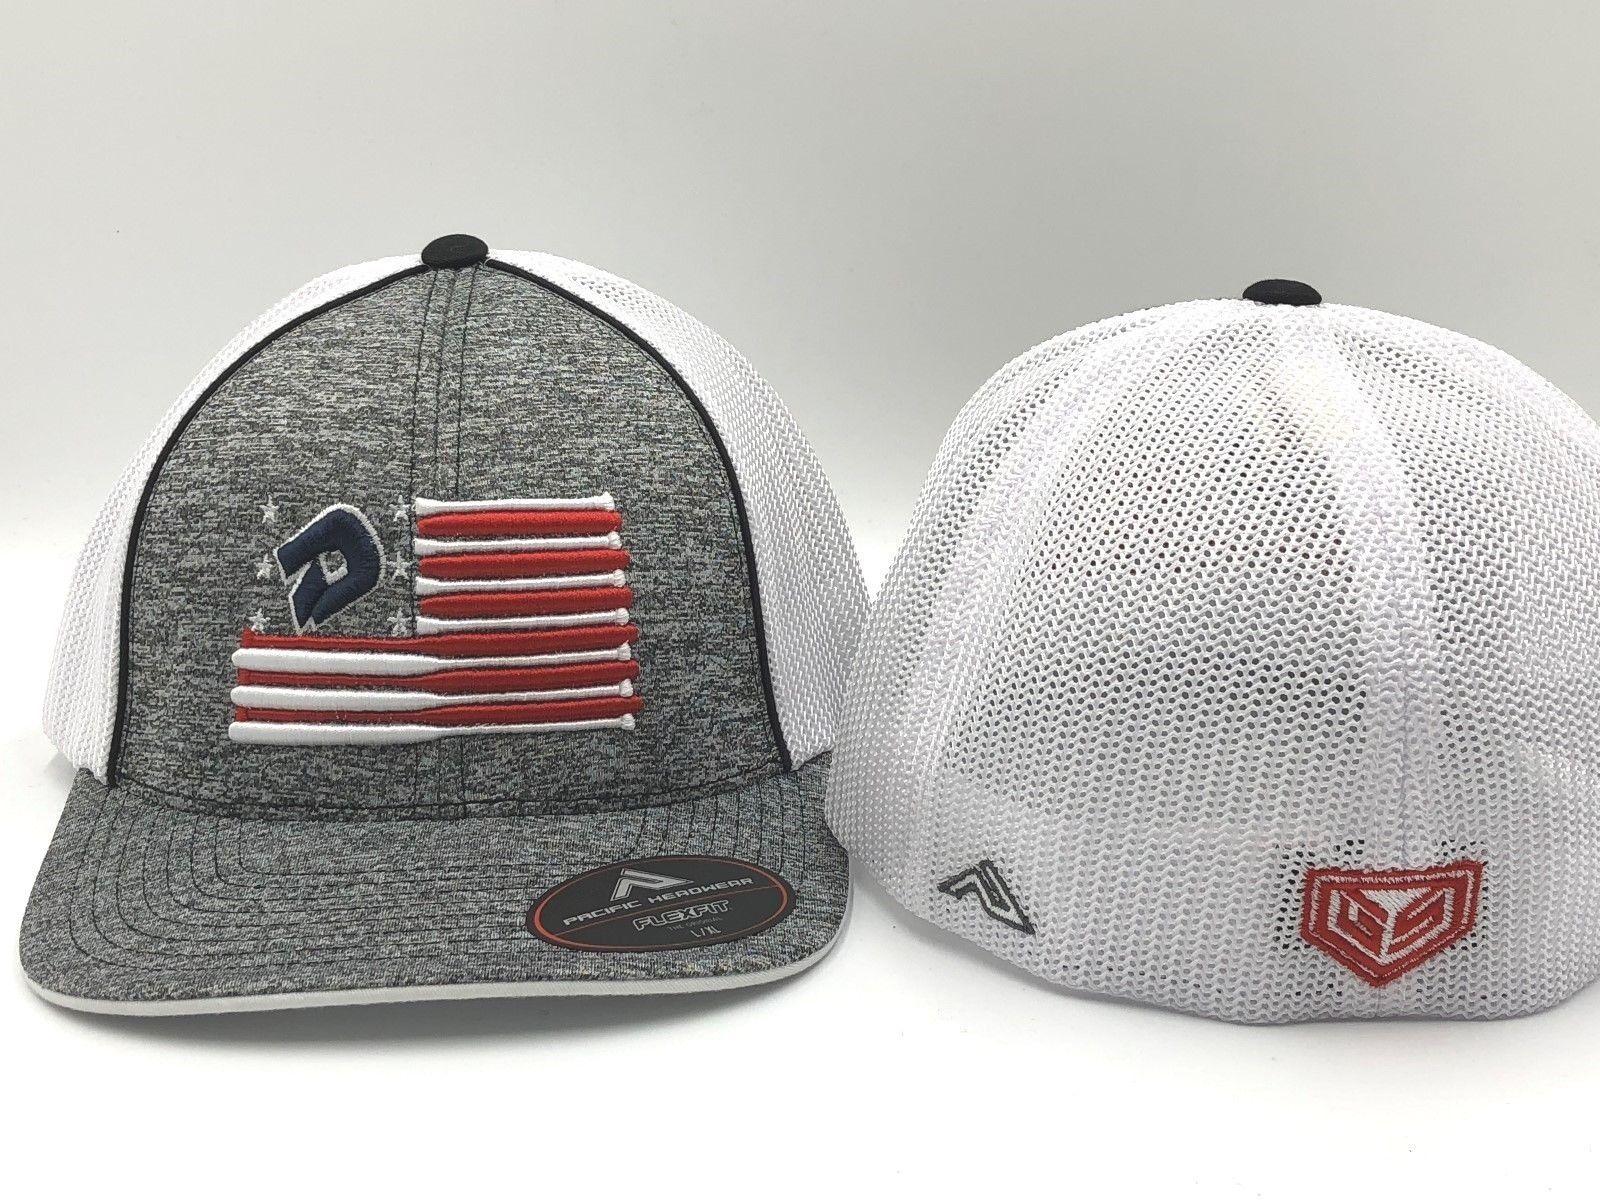 26fcbb33042 Hats and Headwear 159057  Demarini America Bat Flag Flexfit Trucker Style  Heather Hat -